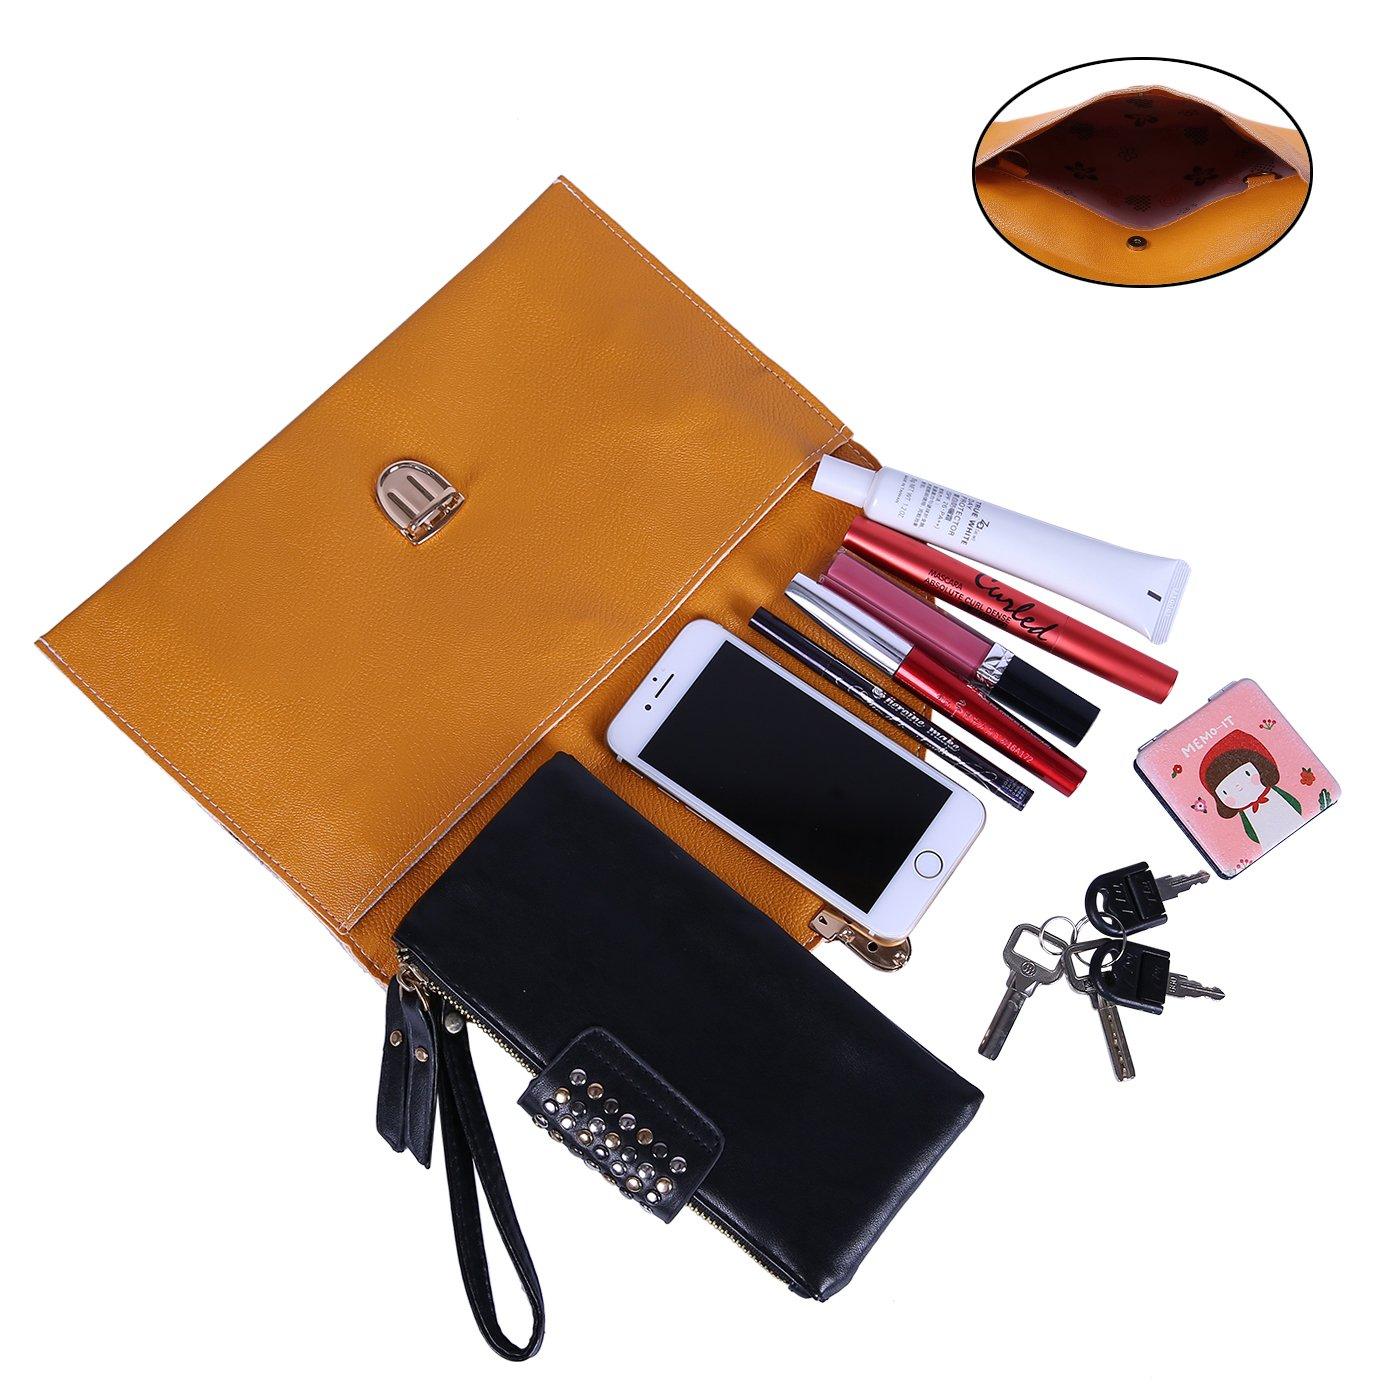 HDE Women's Fashion Cross Body Gold Buckle Purse Vegan Leather Envelope Handbag by HDE (Image #5)